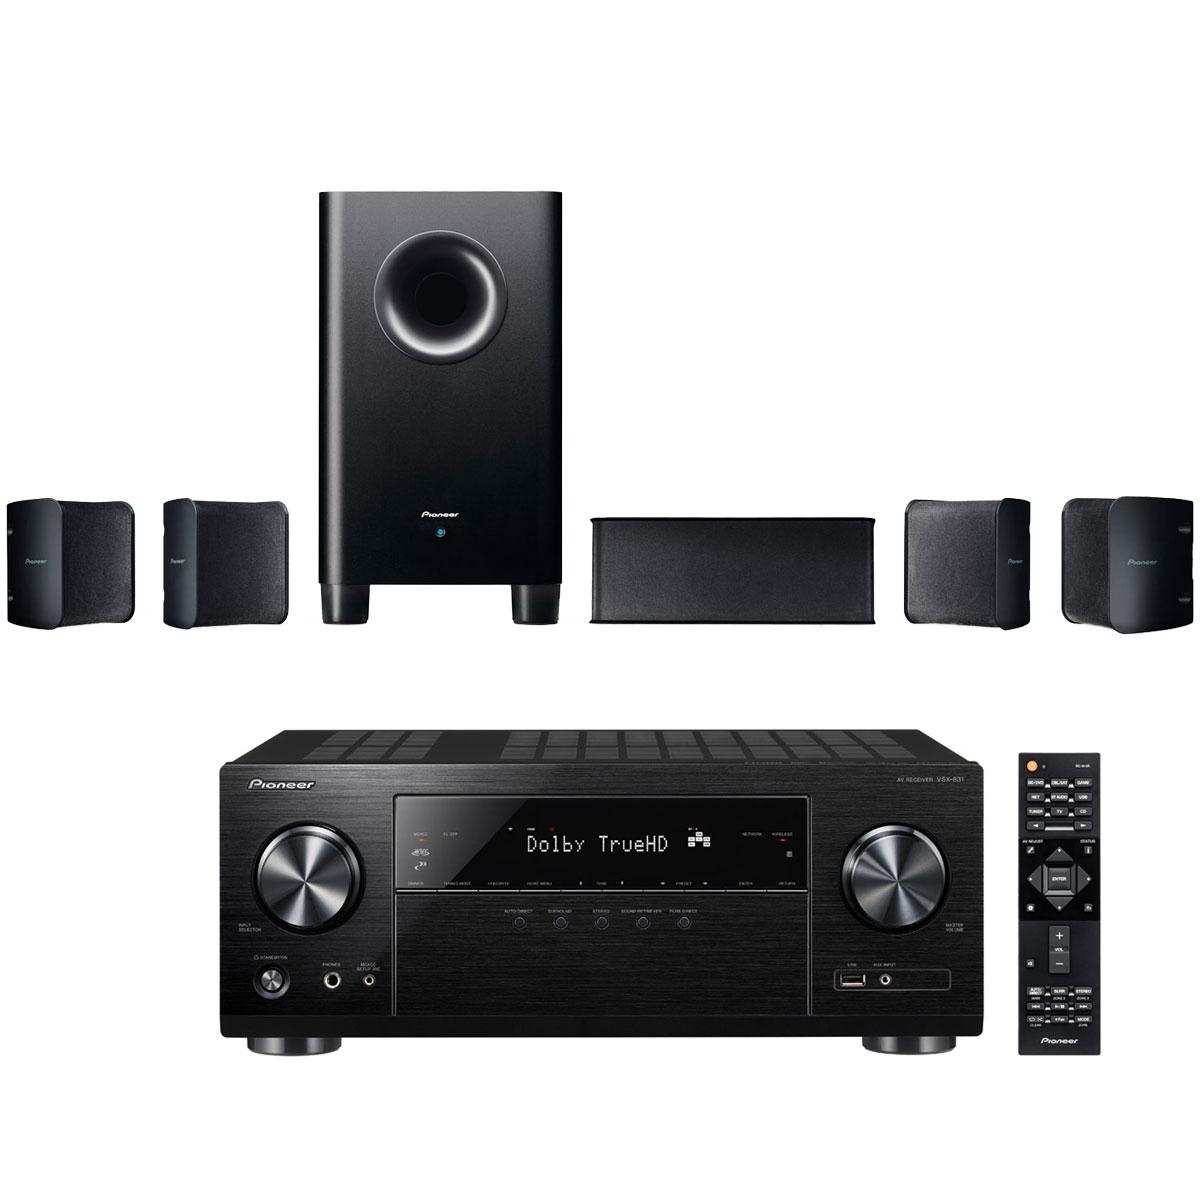 Ensemble home cinéma Pioneer VSX-831B + S-HS100 Ampli-tuner Home Cinéma 5.1 Bluetooth, Wi-FI, Airplay, Google Cast, DLNA, HDCP 2.2, TuneIn, Spotify, Tidal, Deezer et Upscaling Ultra HD 4K avec 6 entrées HDMI + Pack d'enceintes compactes 5.1